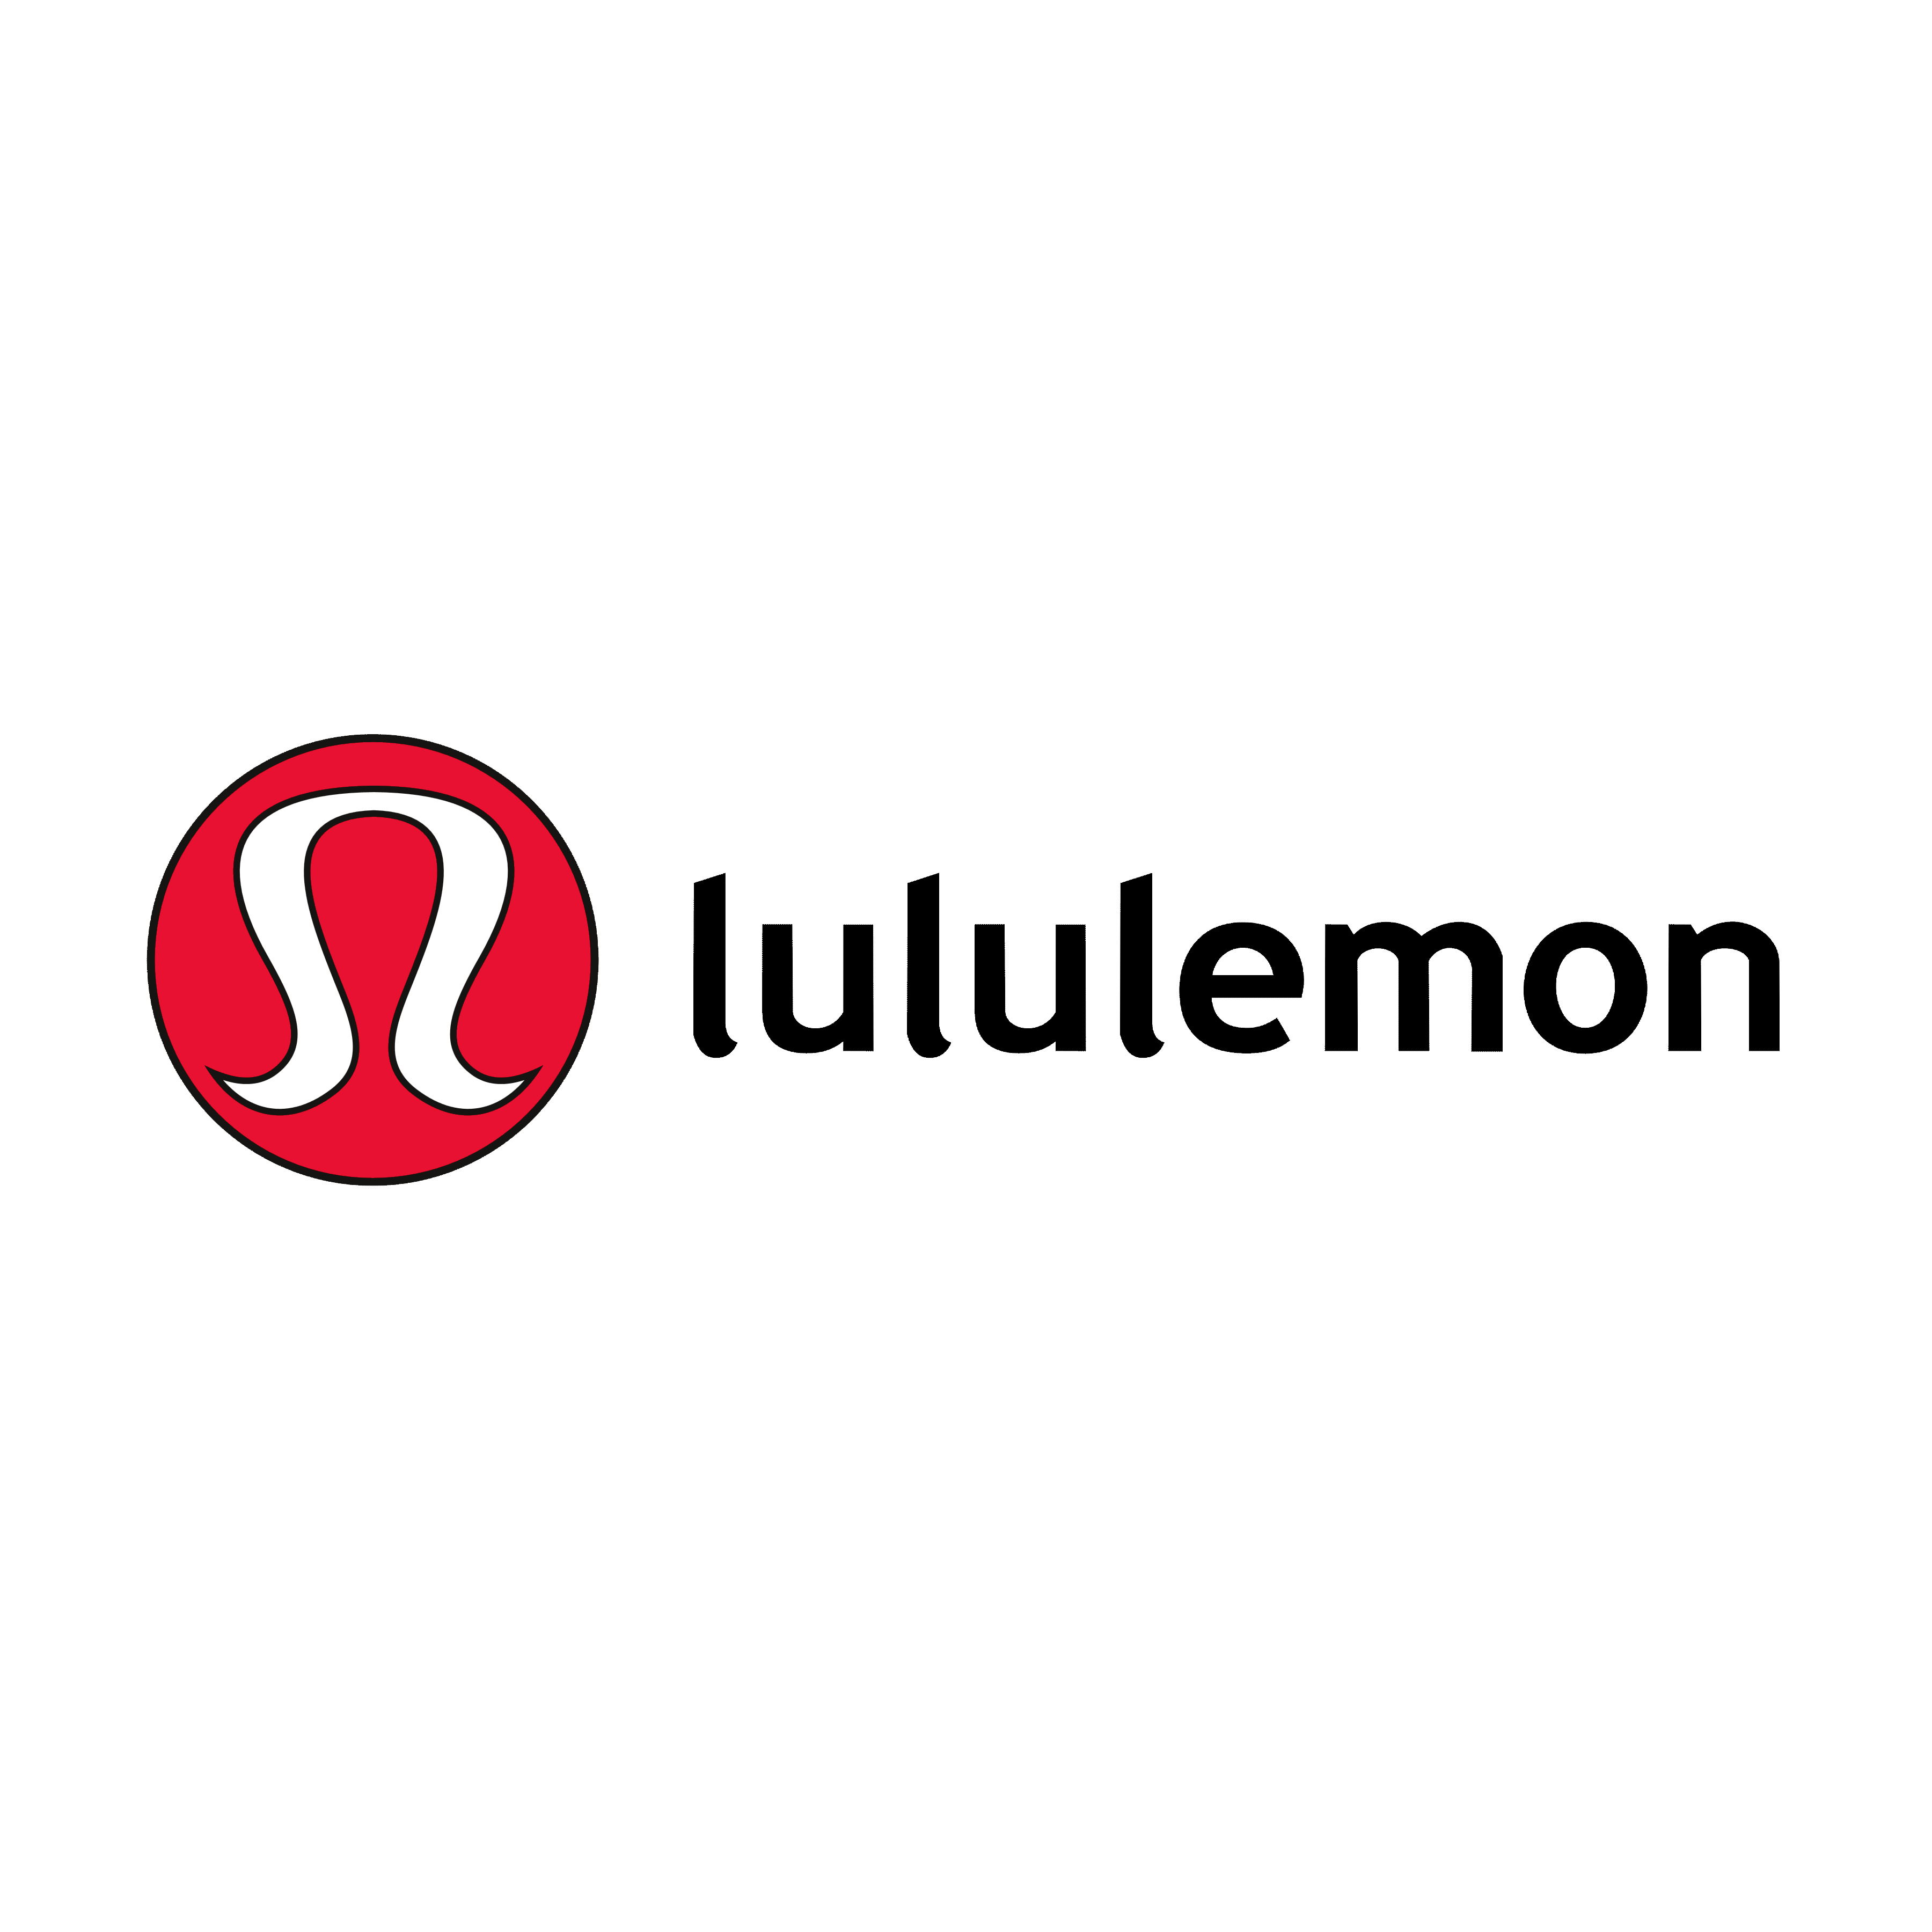 lululemon - photo #24